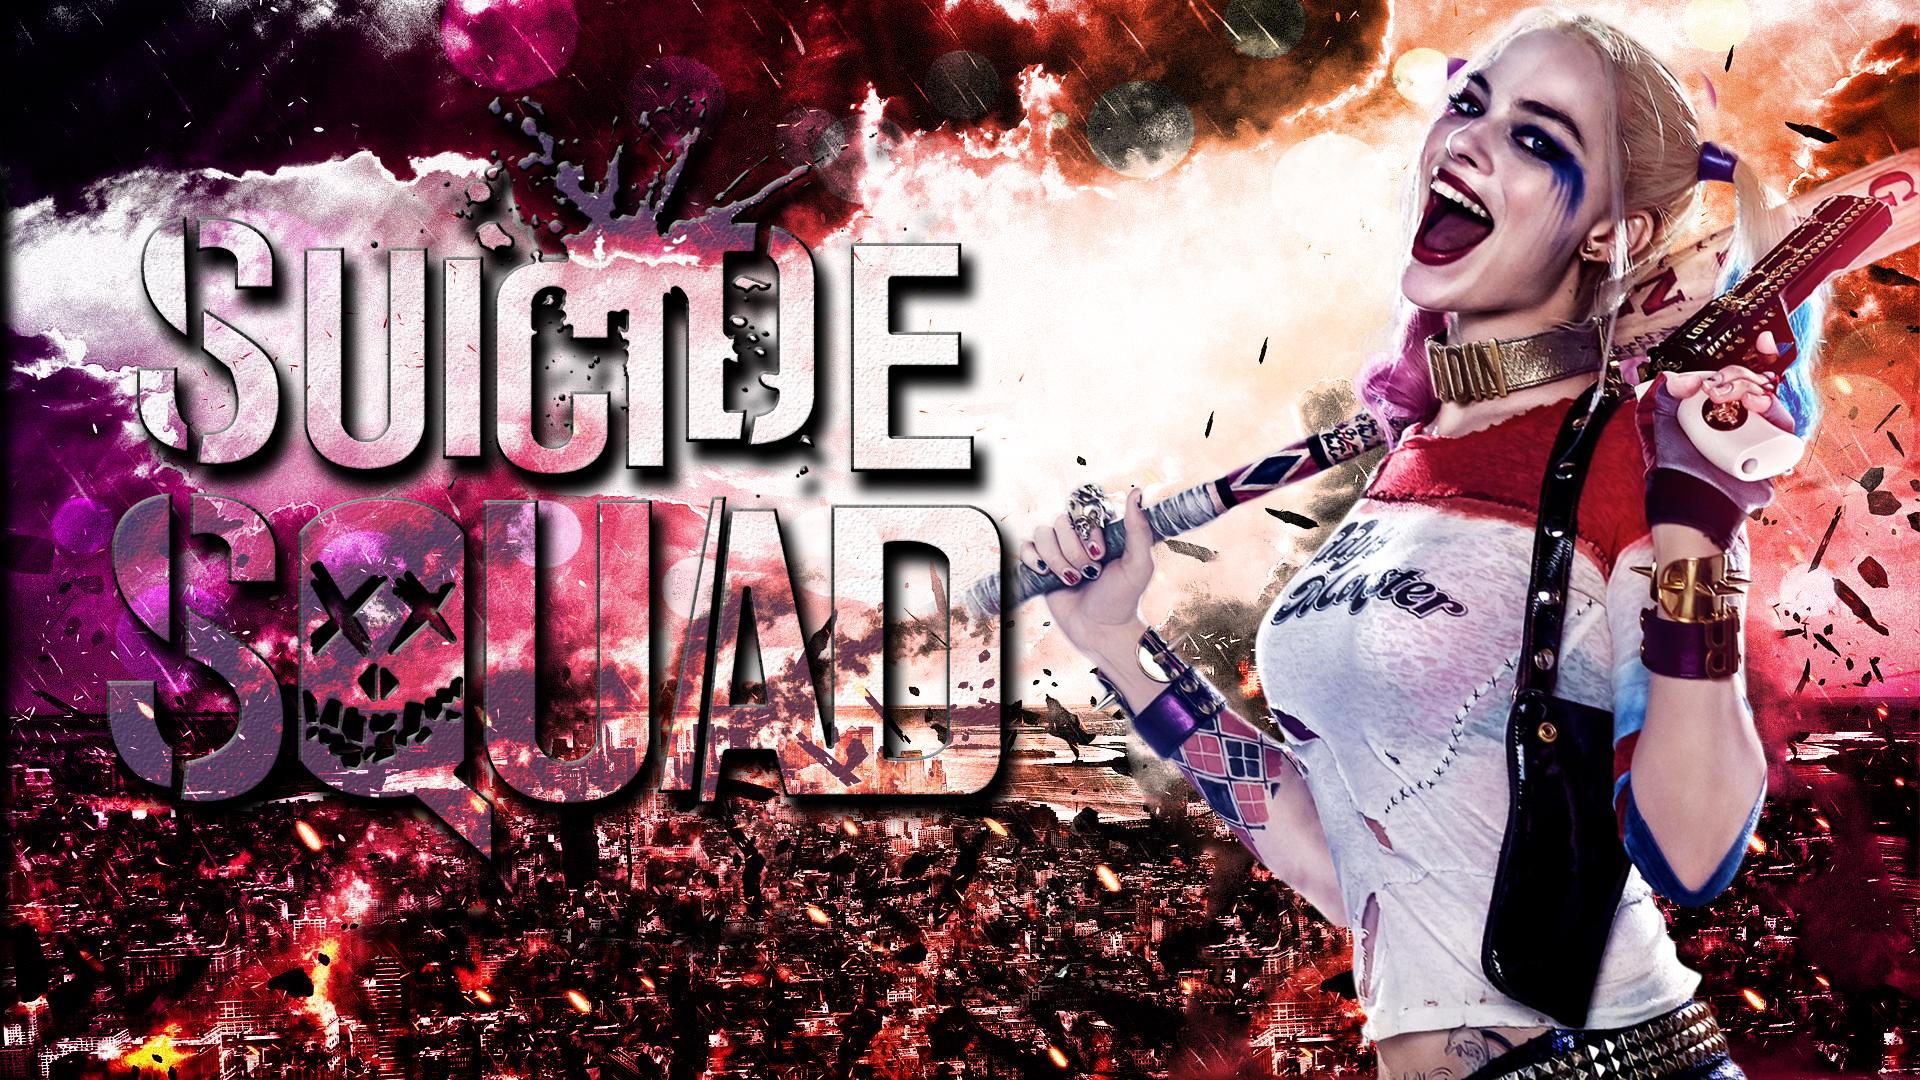 Suicide Squad Harley Quinn Wallpaper Wallpapersafari